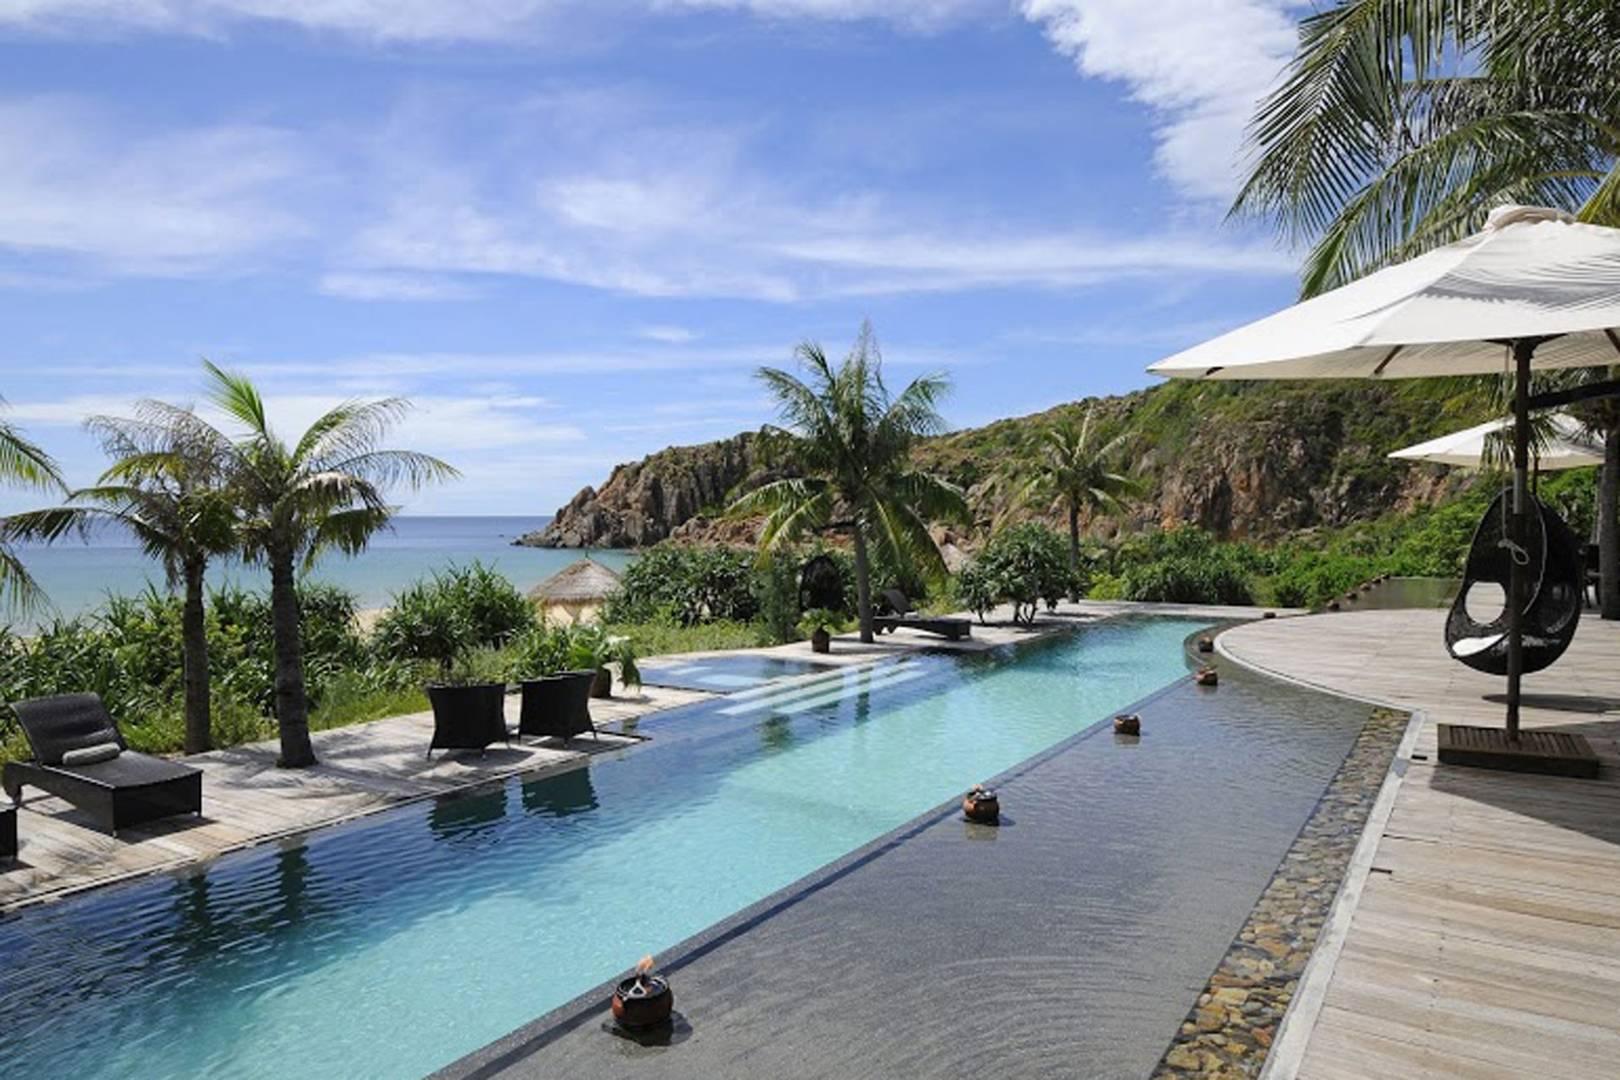 Best Hotels In Vietnam Vietnam Travel Guide Cn Traveller